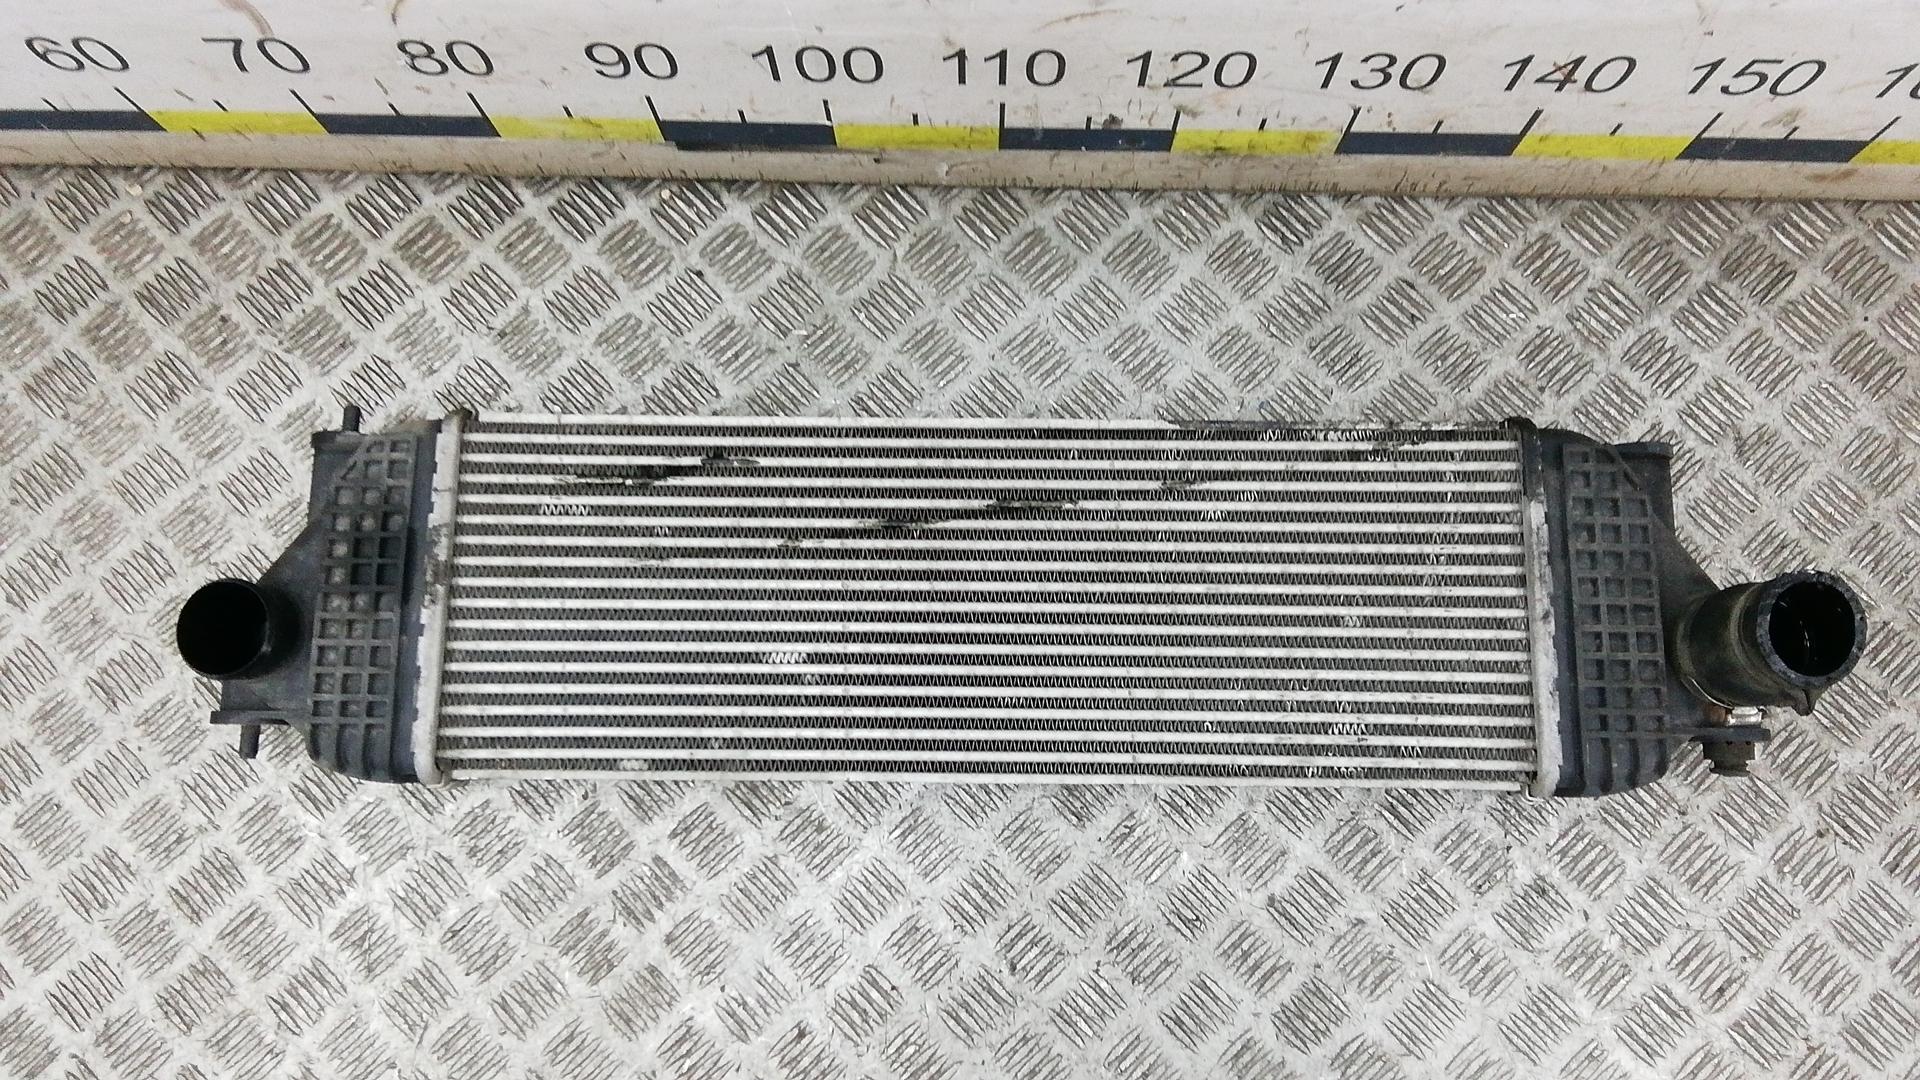 Радиатор интеркуллера, SUZUKI, GRAND VITARA 2, 2006